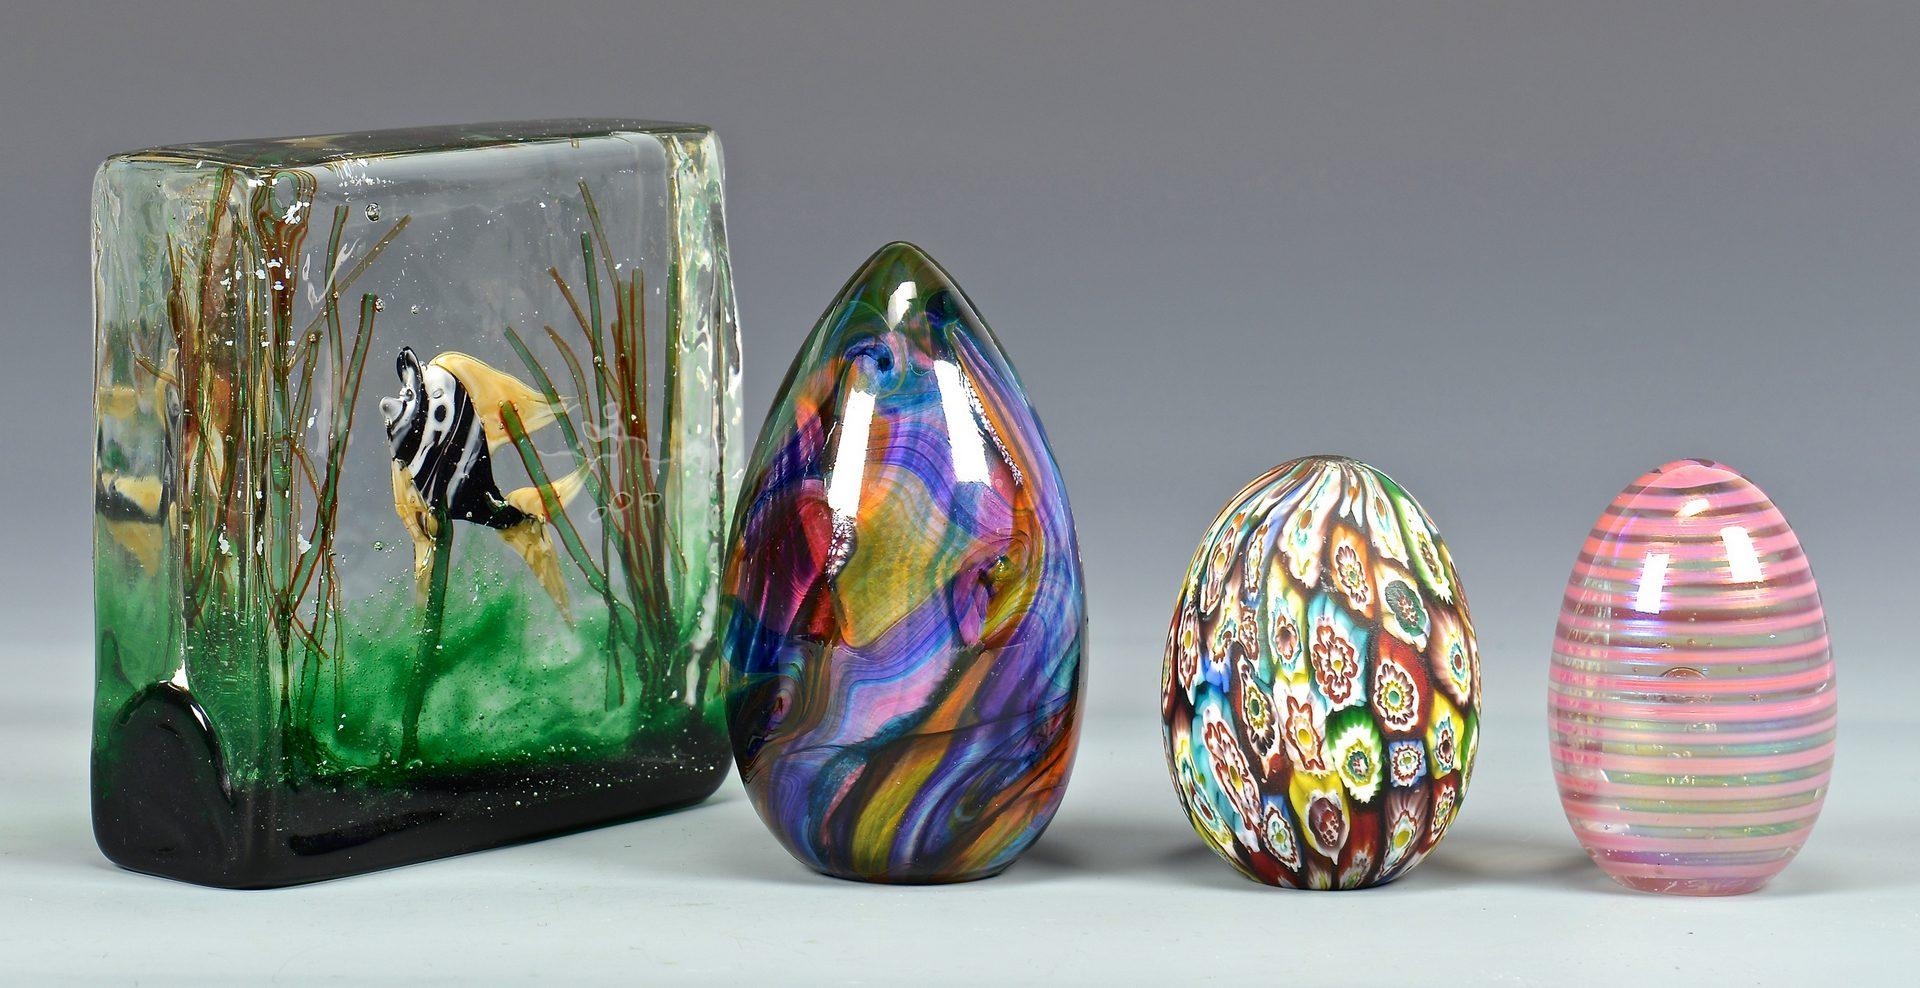 Lot 112: Group of Art Glass Items, 9 pcs.